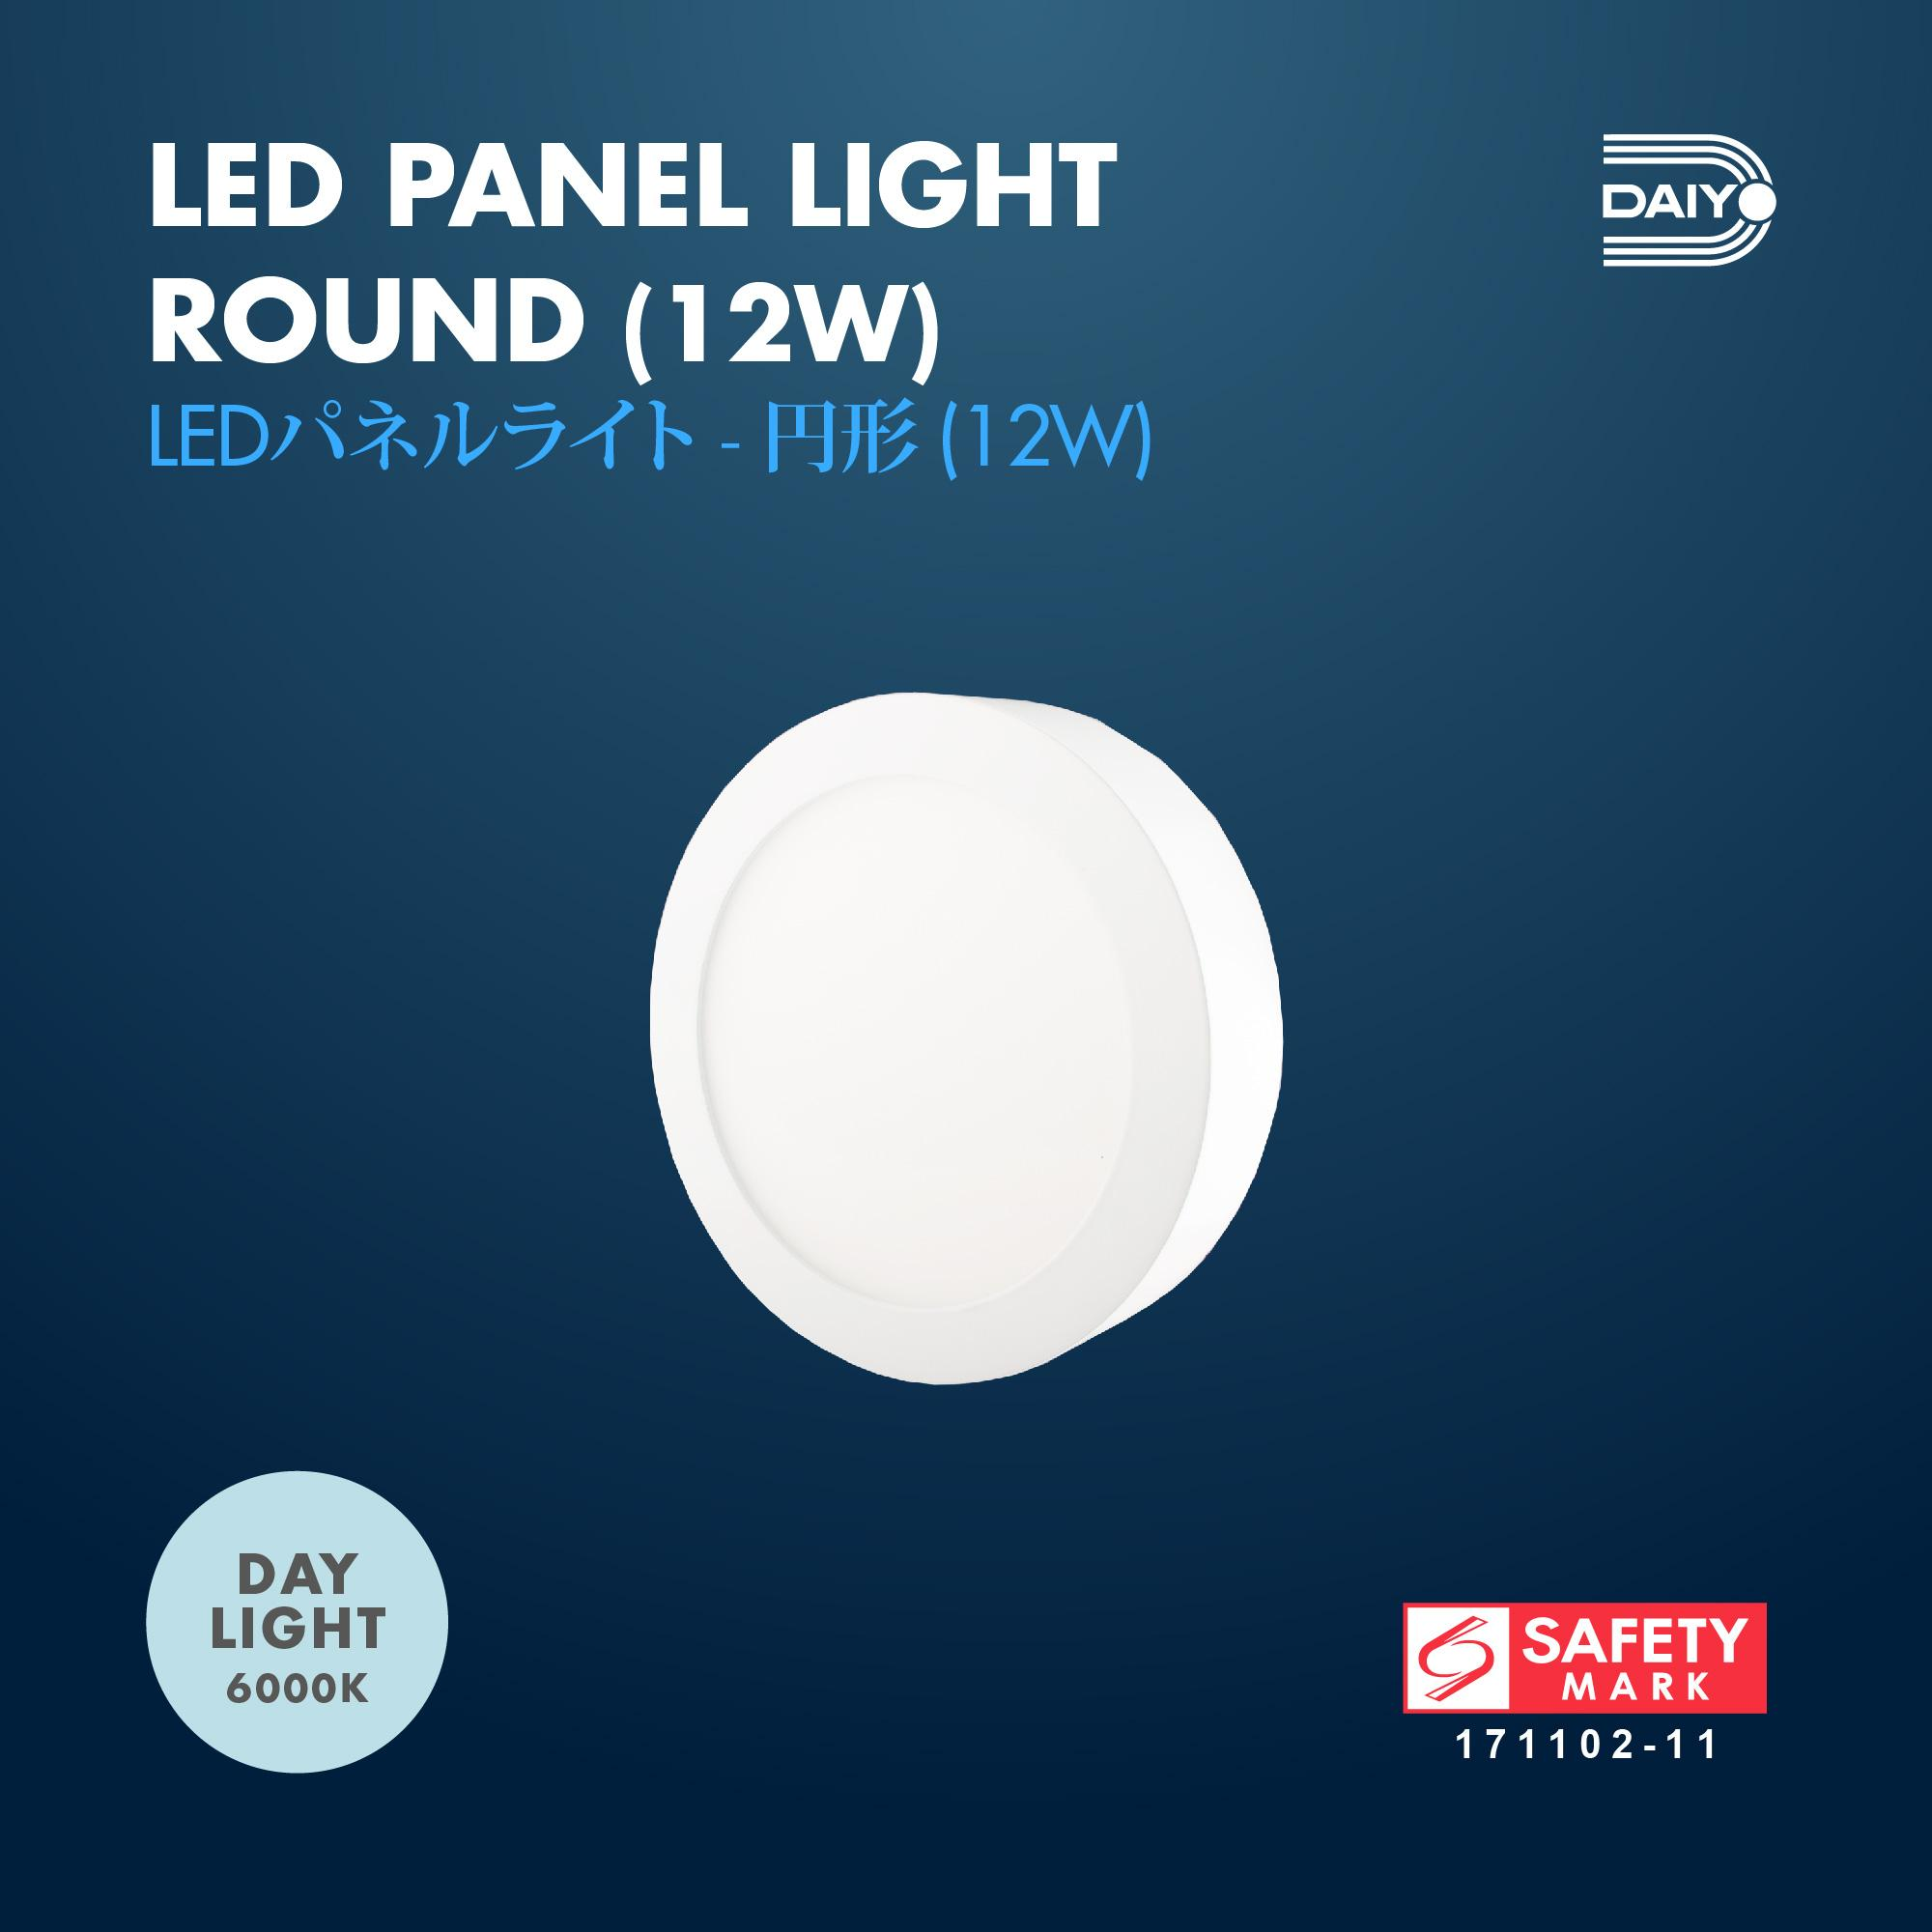 12W LED Surfaced Panel Light Round Shape (Day Light)